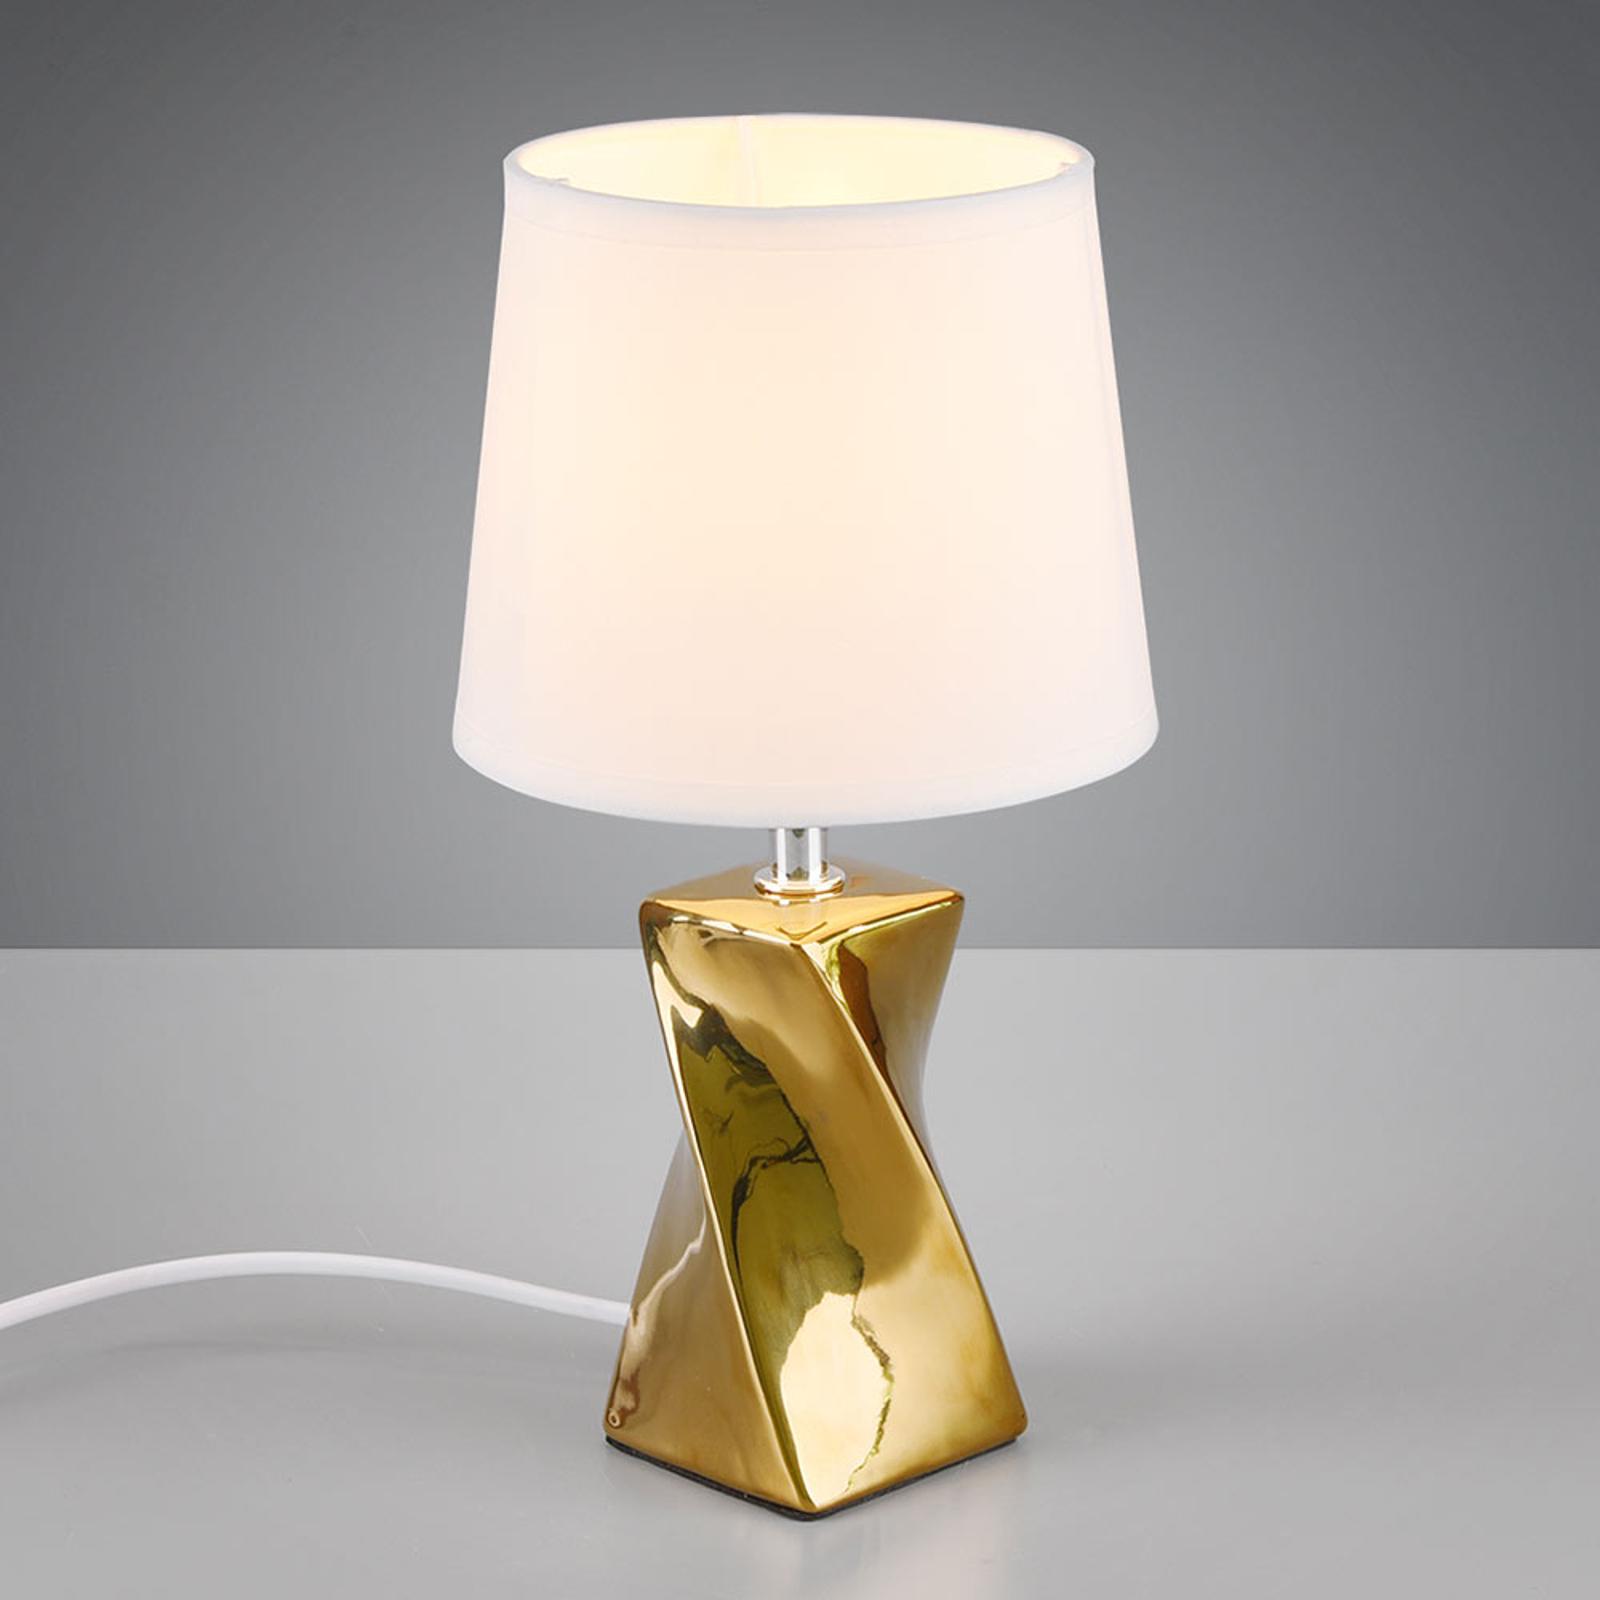 Tafellamp Abeba, Ø 15 cm, wit-goud